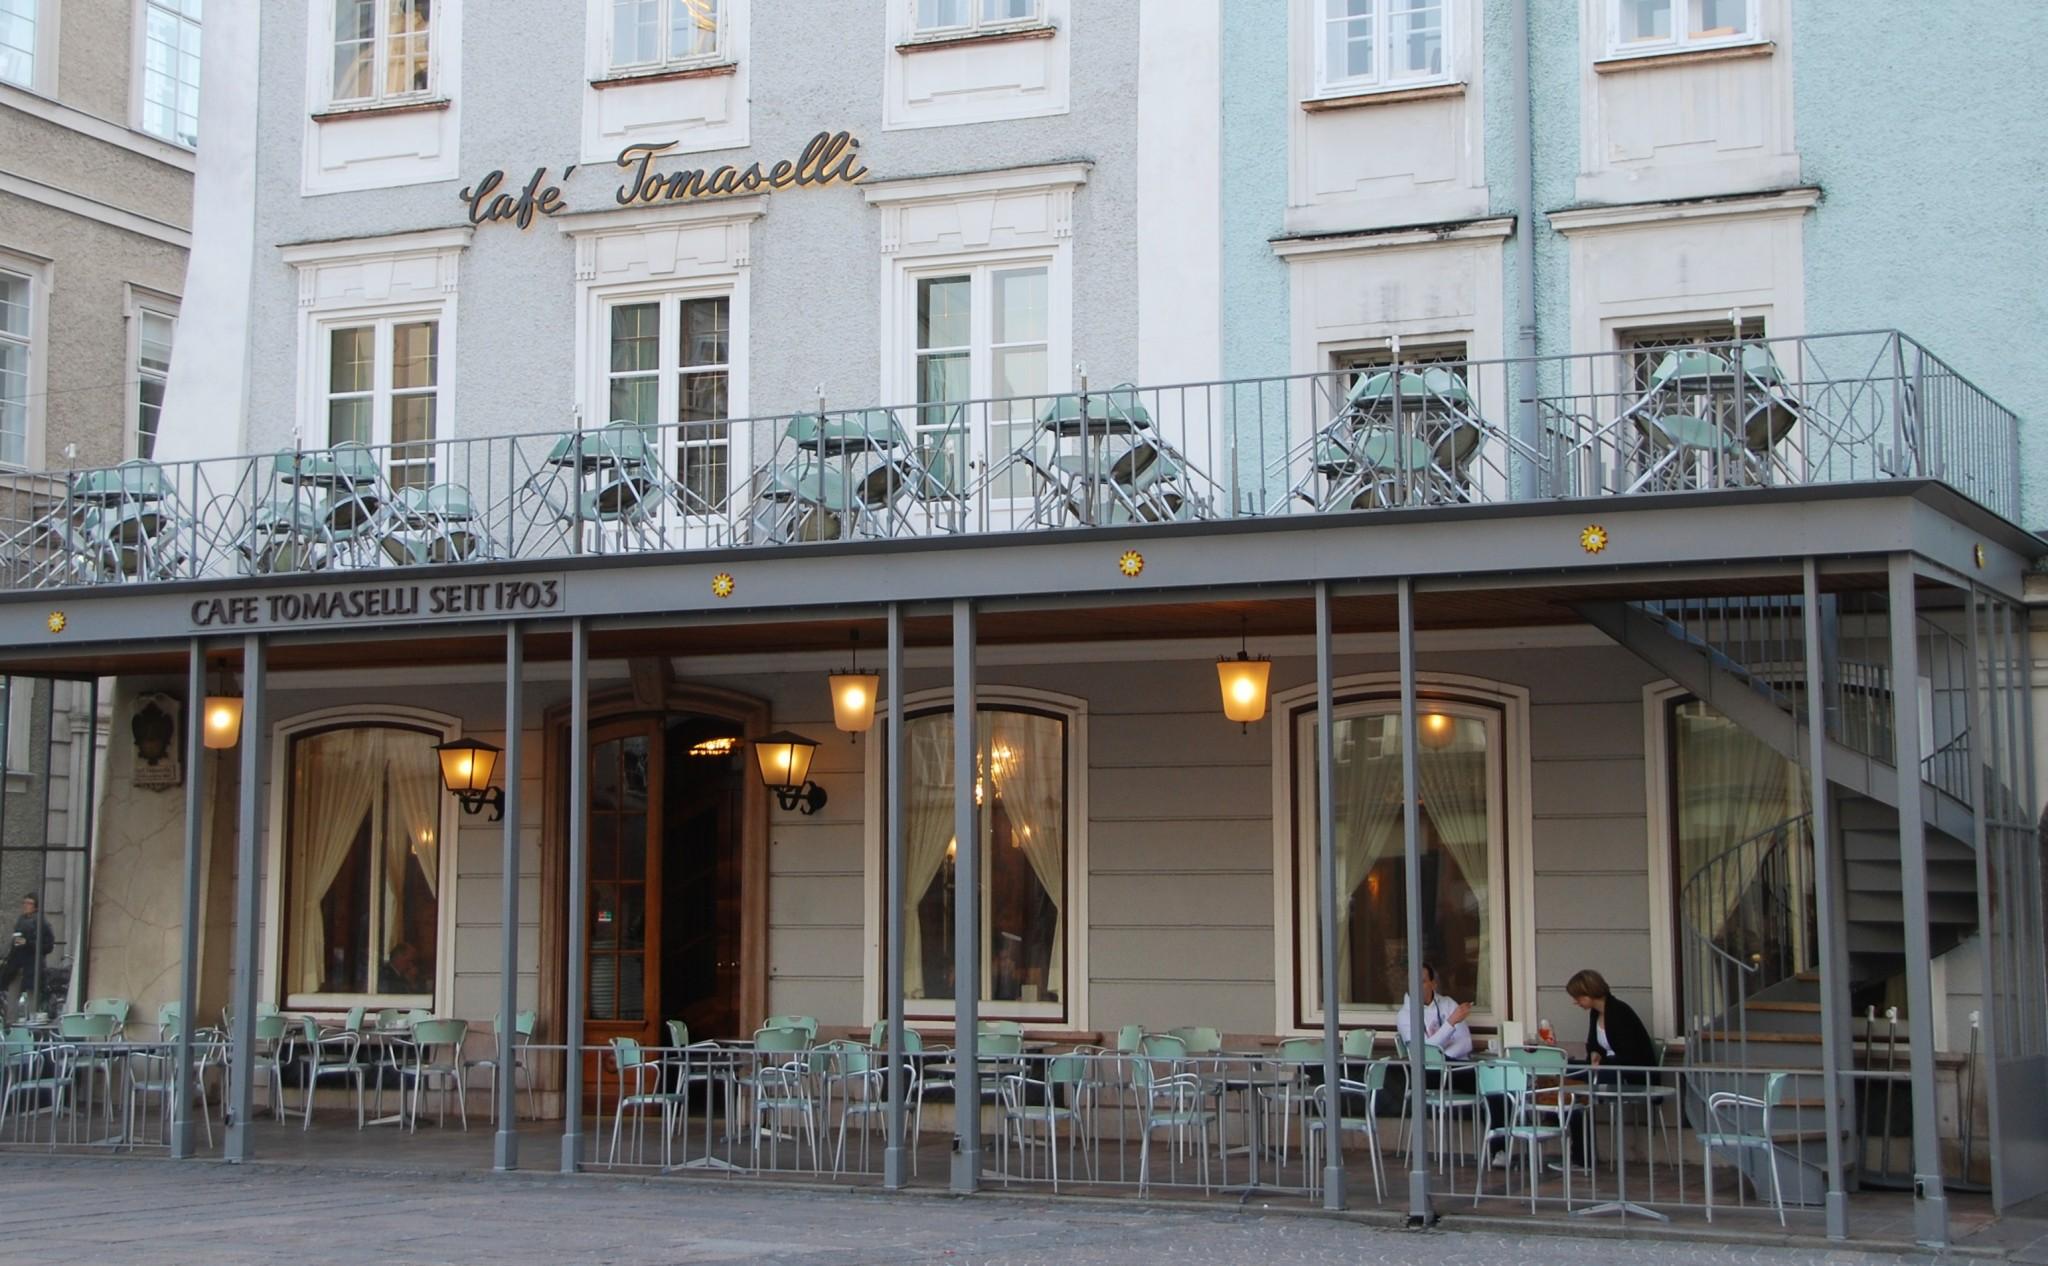 Salzburg Cafe Tomasselli